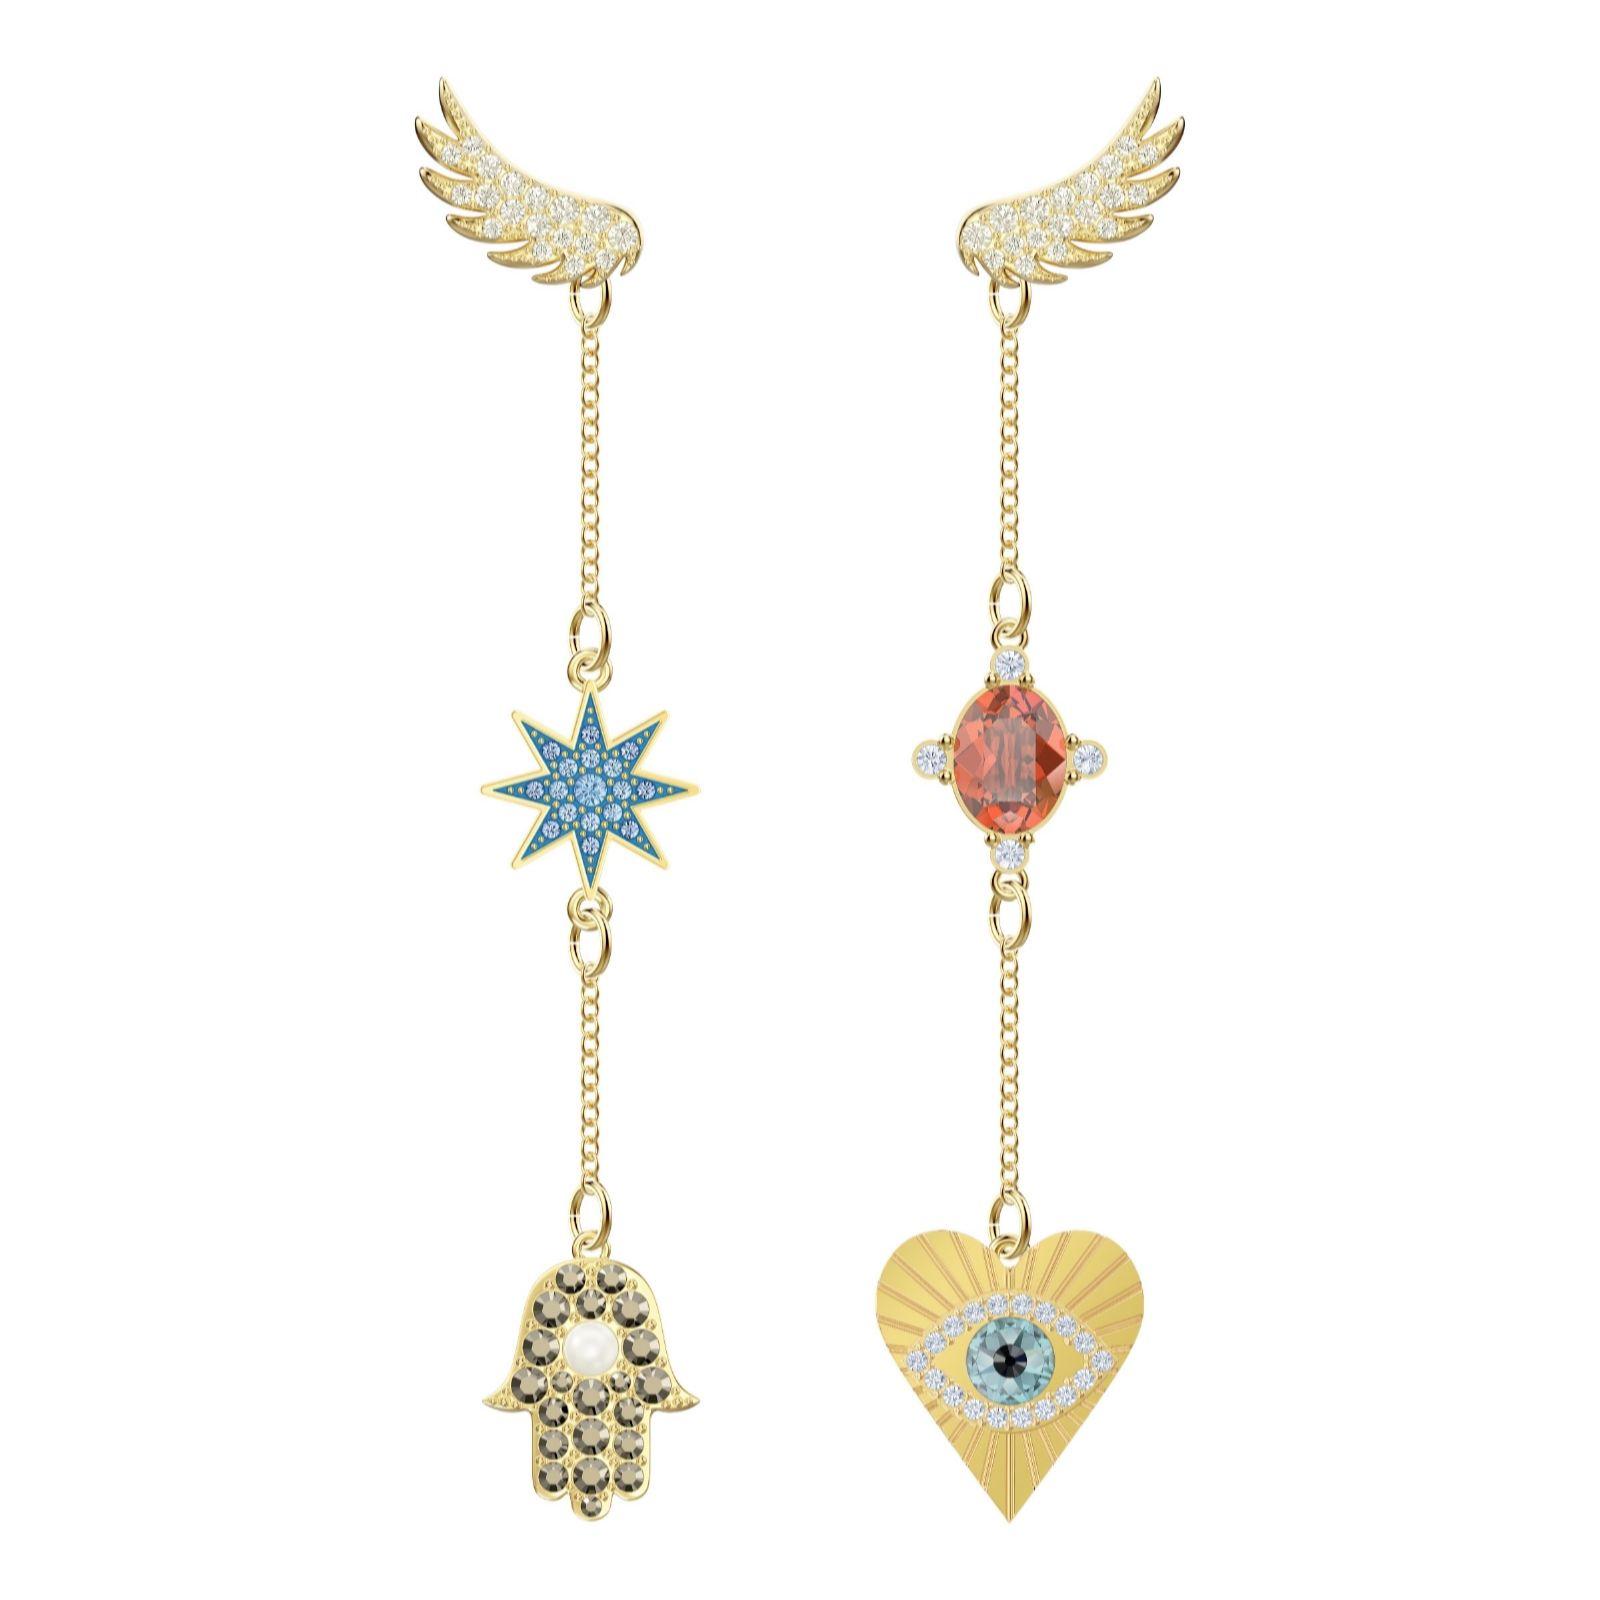 849cb8b3a5a7 Swarovski Lucky Goddess Earrings - QVC UK